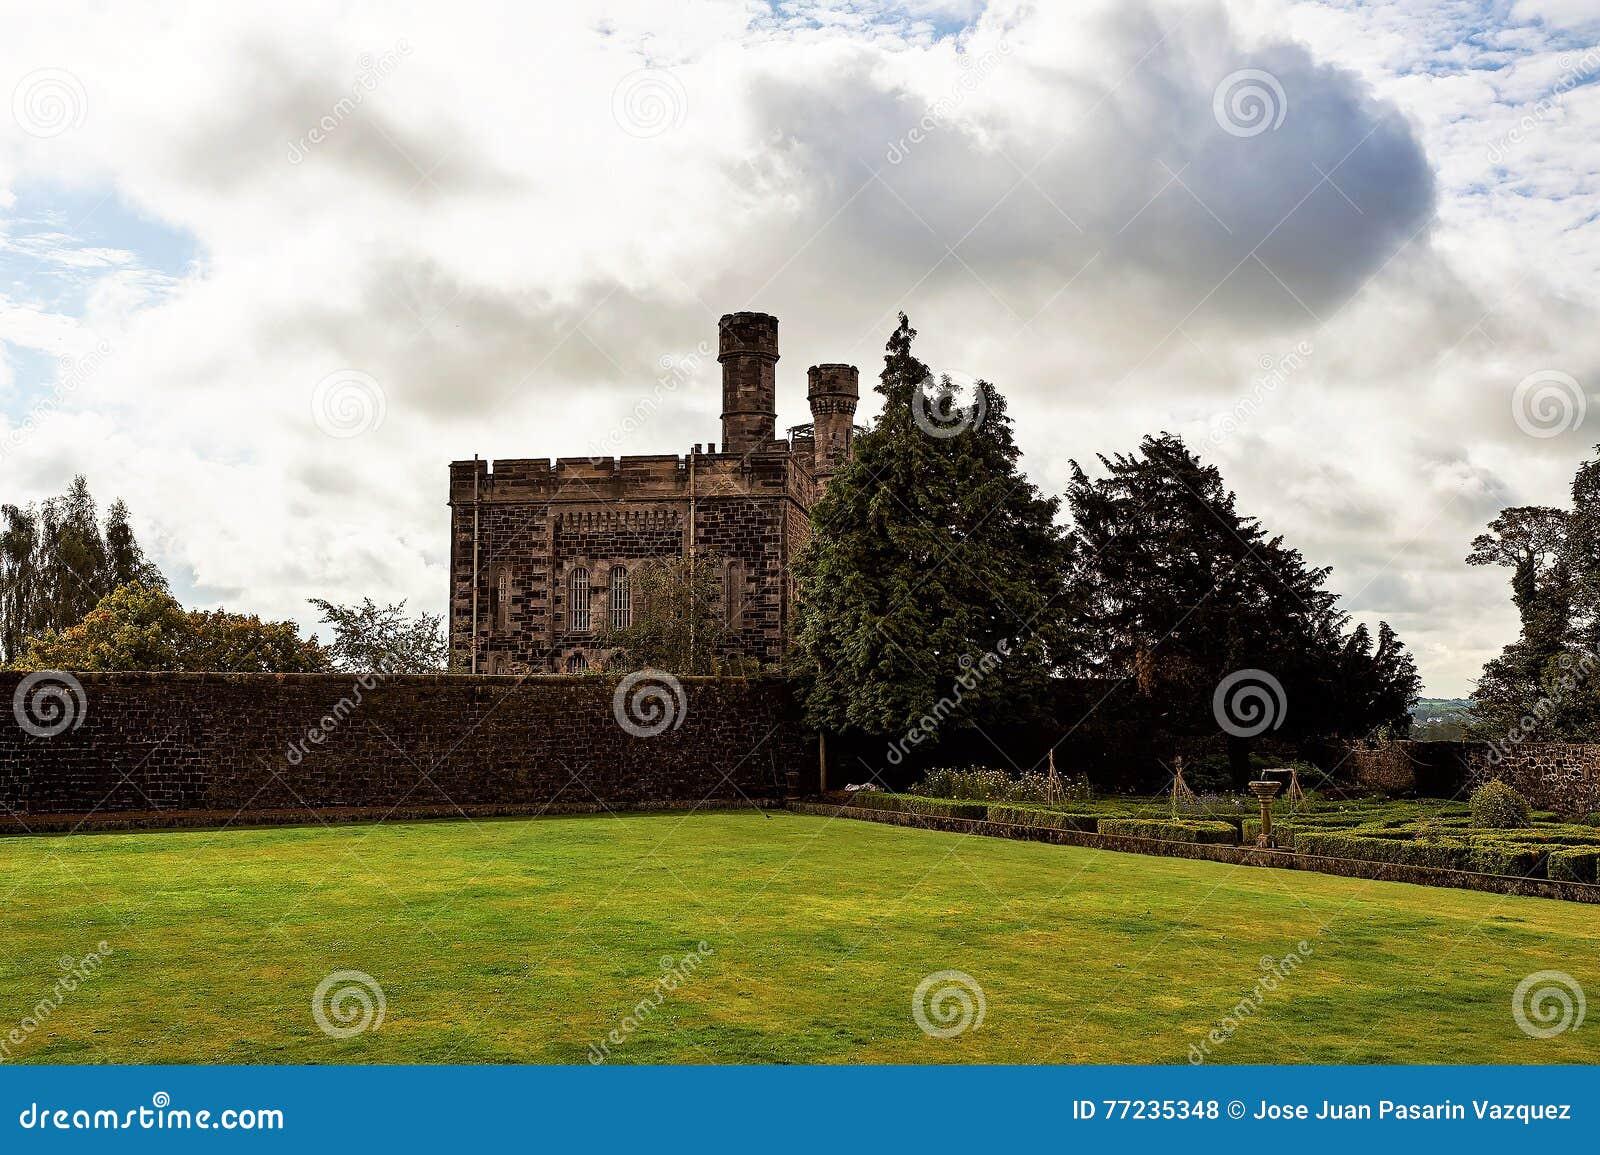 Stirling e monumentos a Robert o Bruce e o William Wallace, Escócia